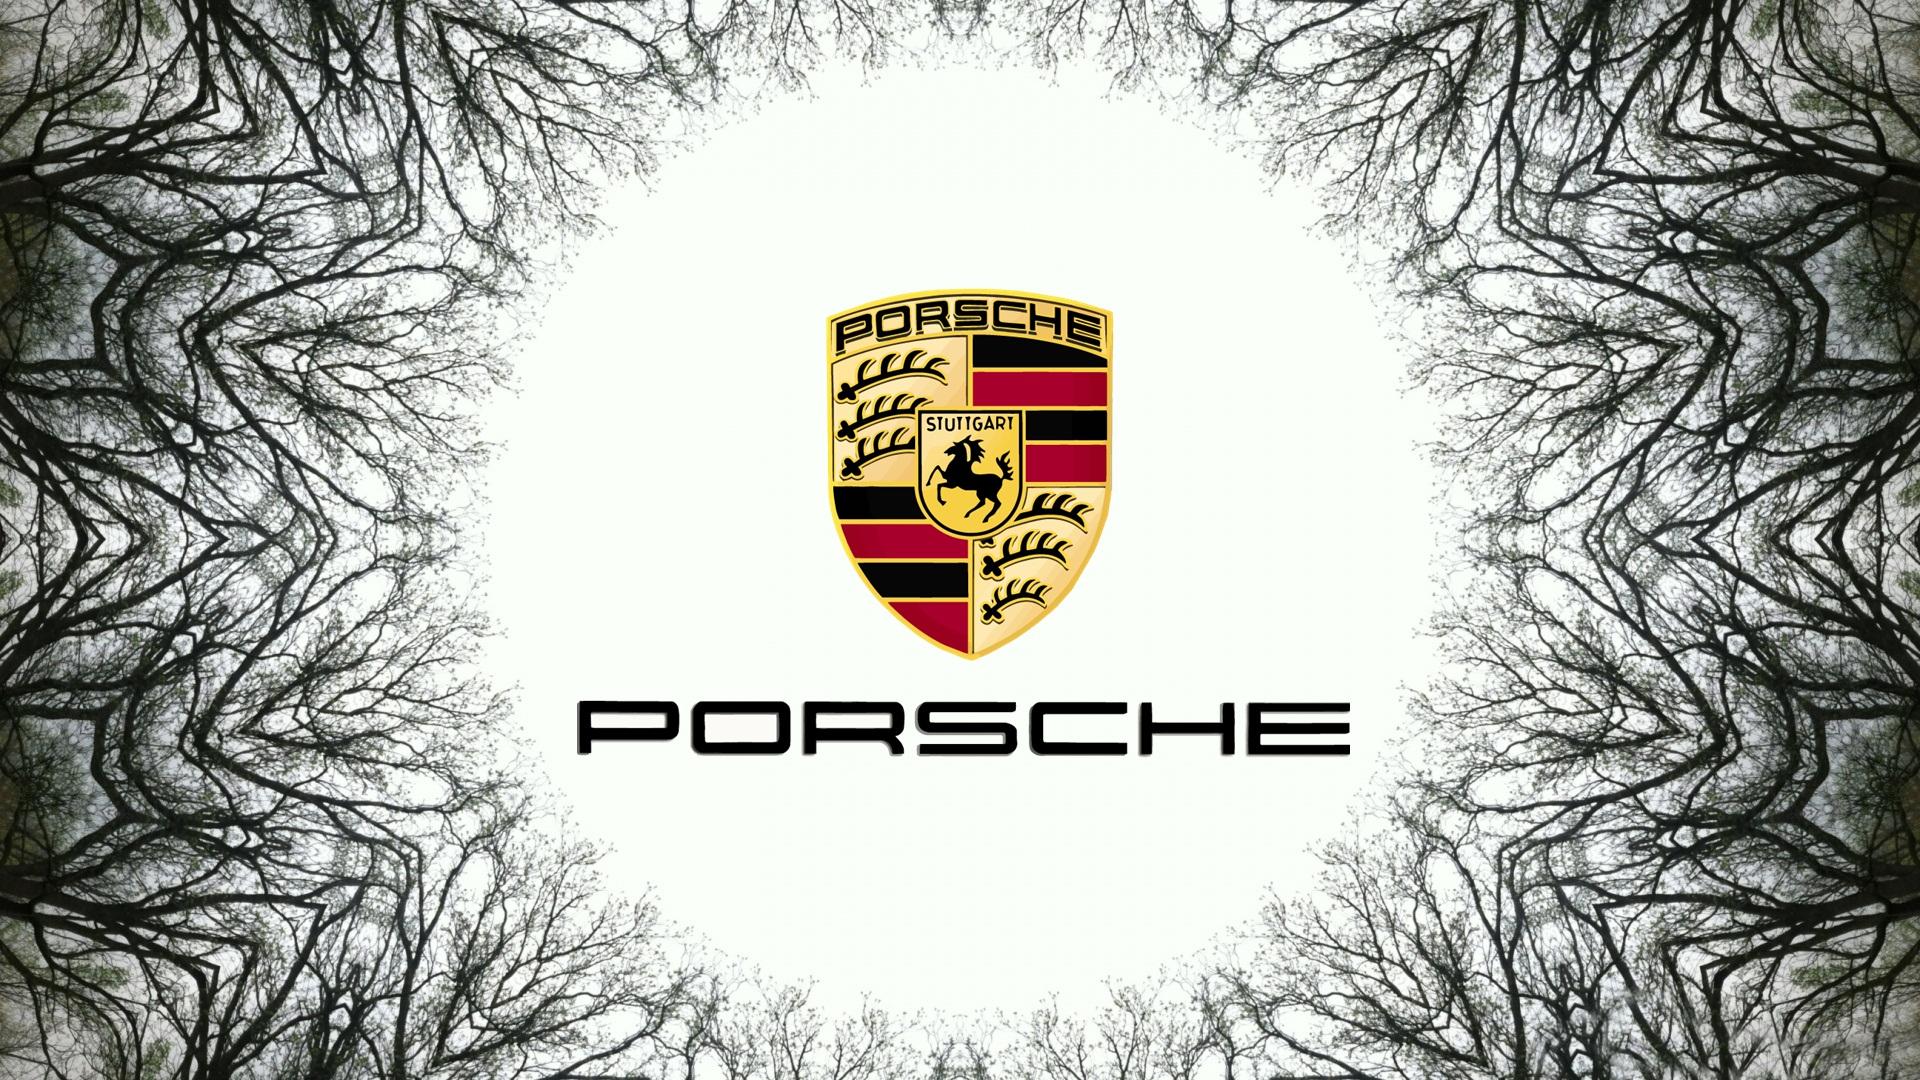 Porsche Logo Wallpapers Pictures Images